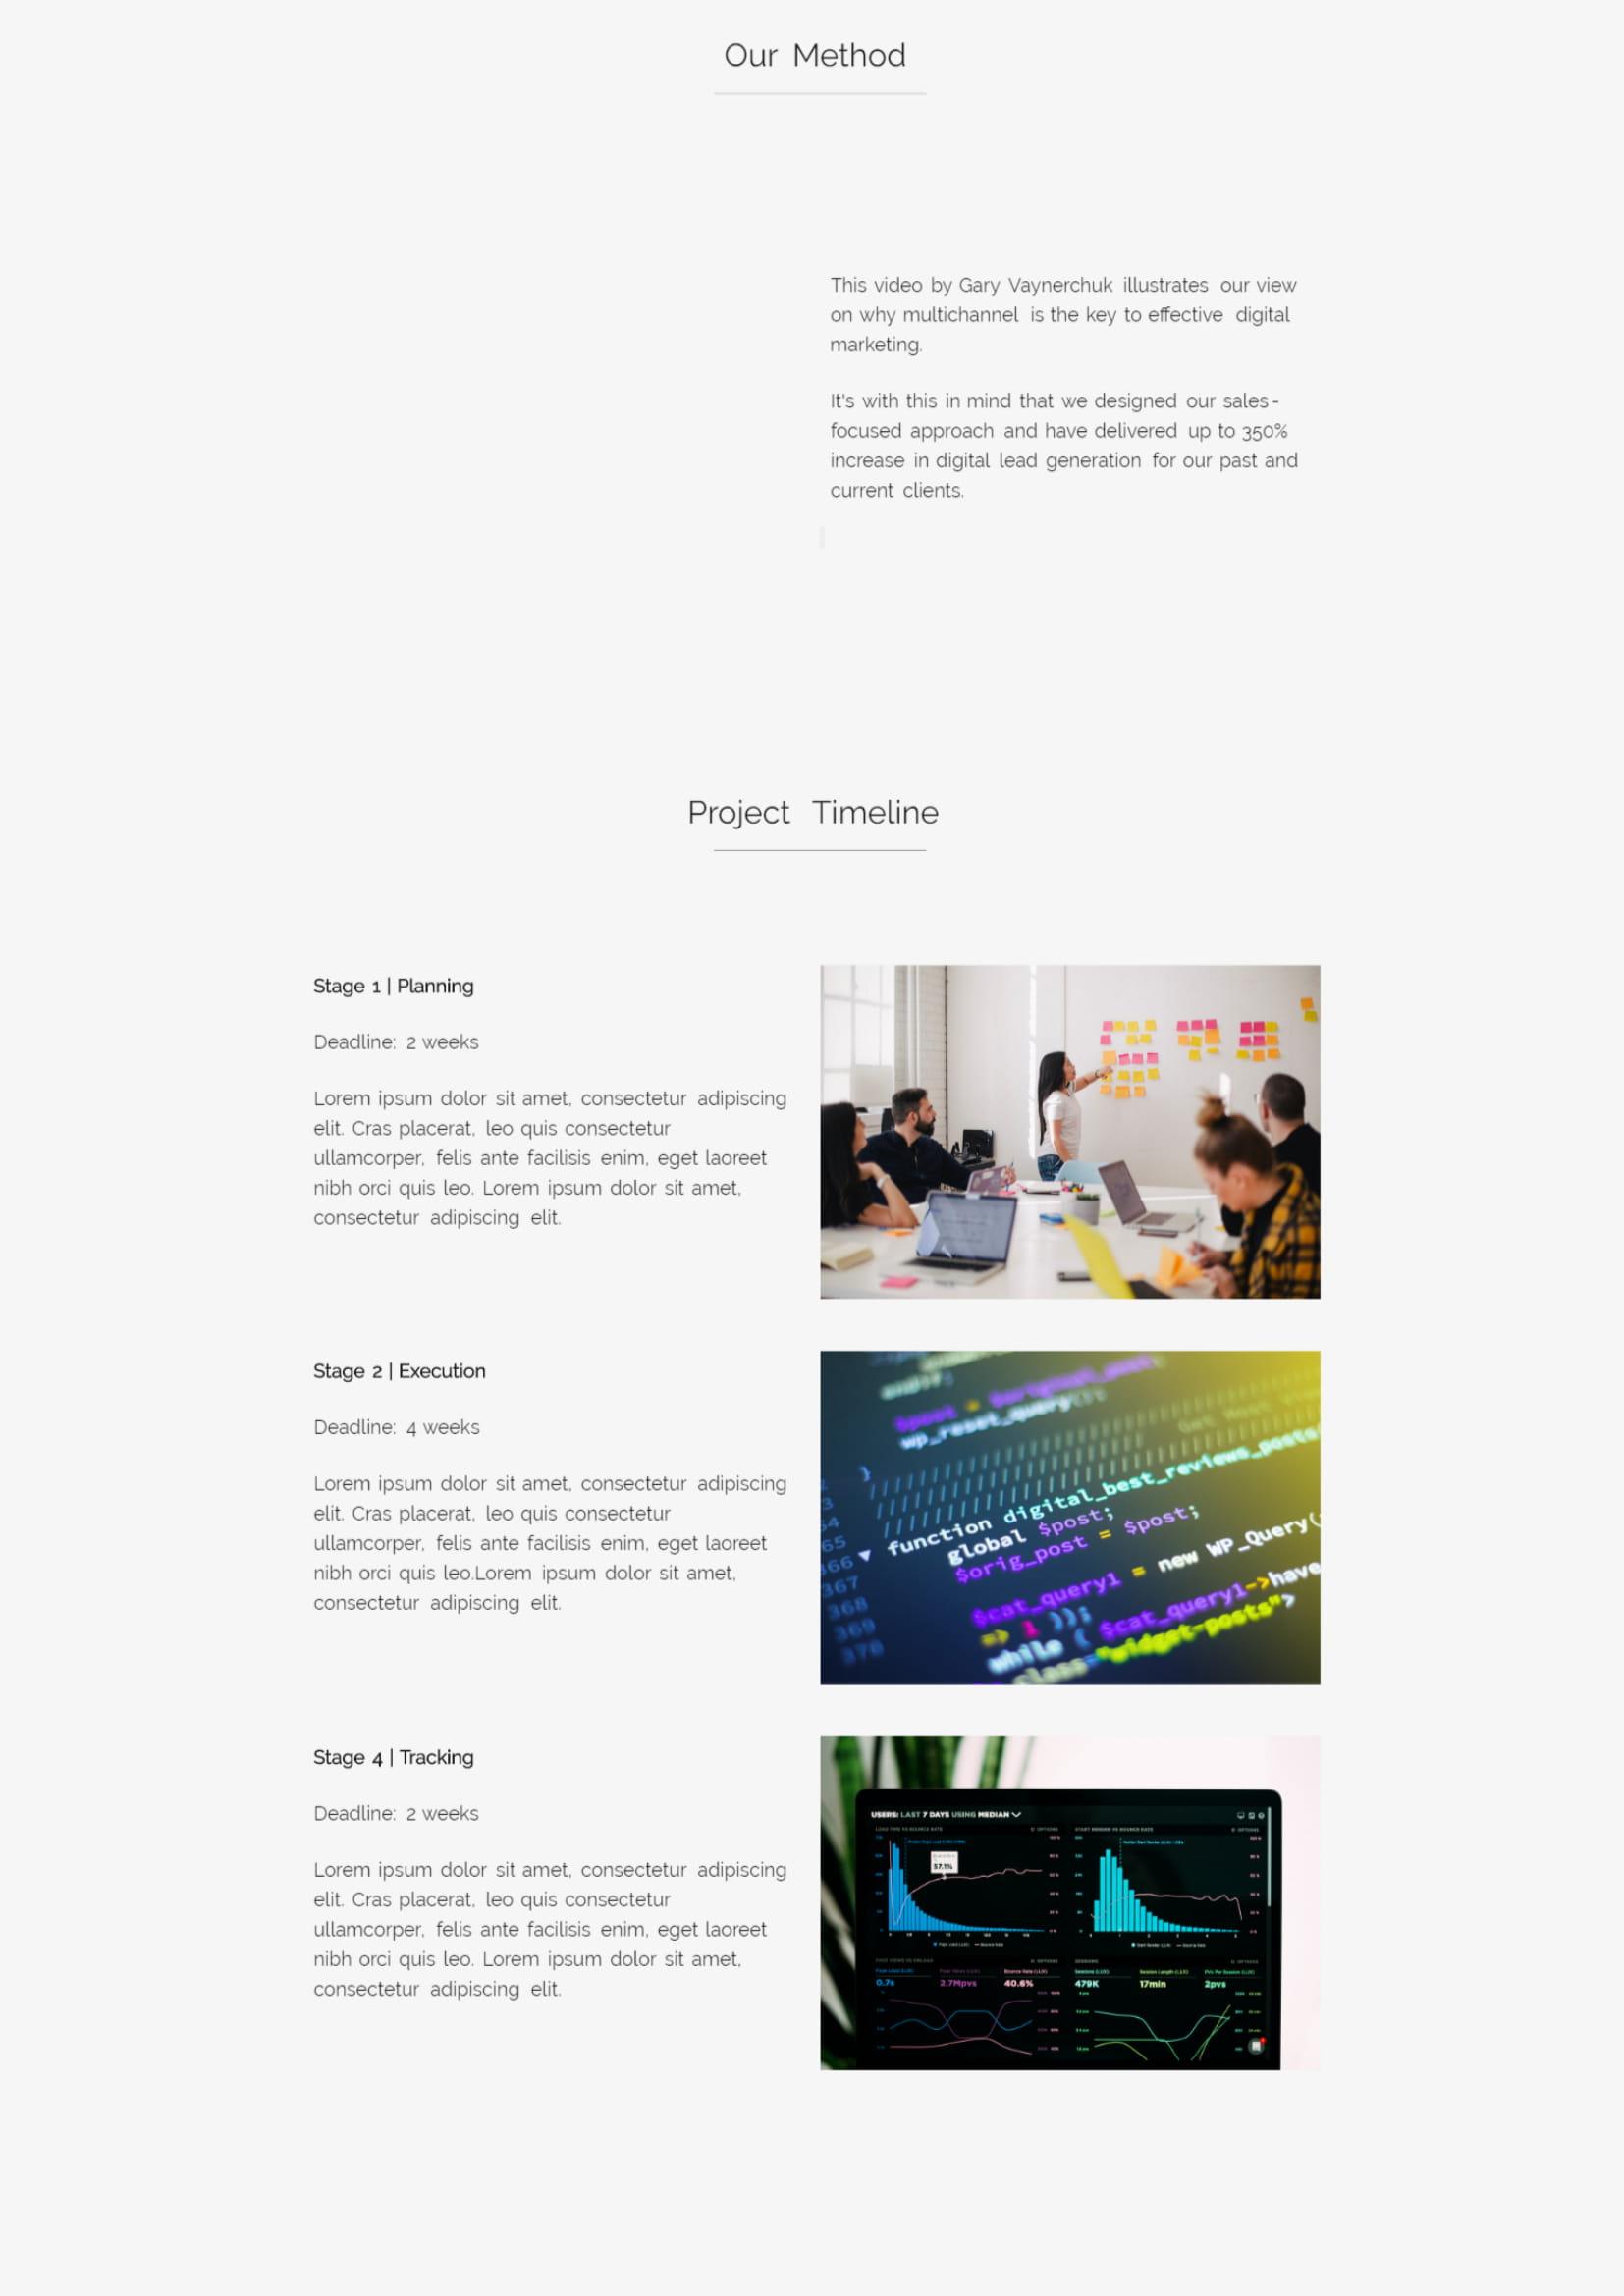 proposta-marketing-digital-1